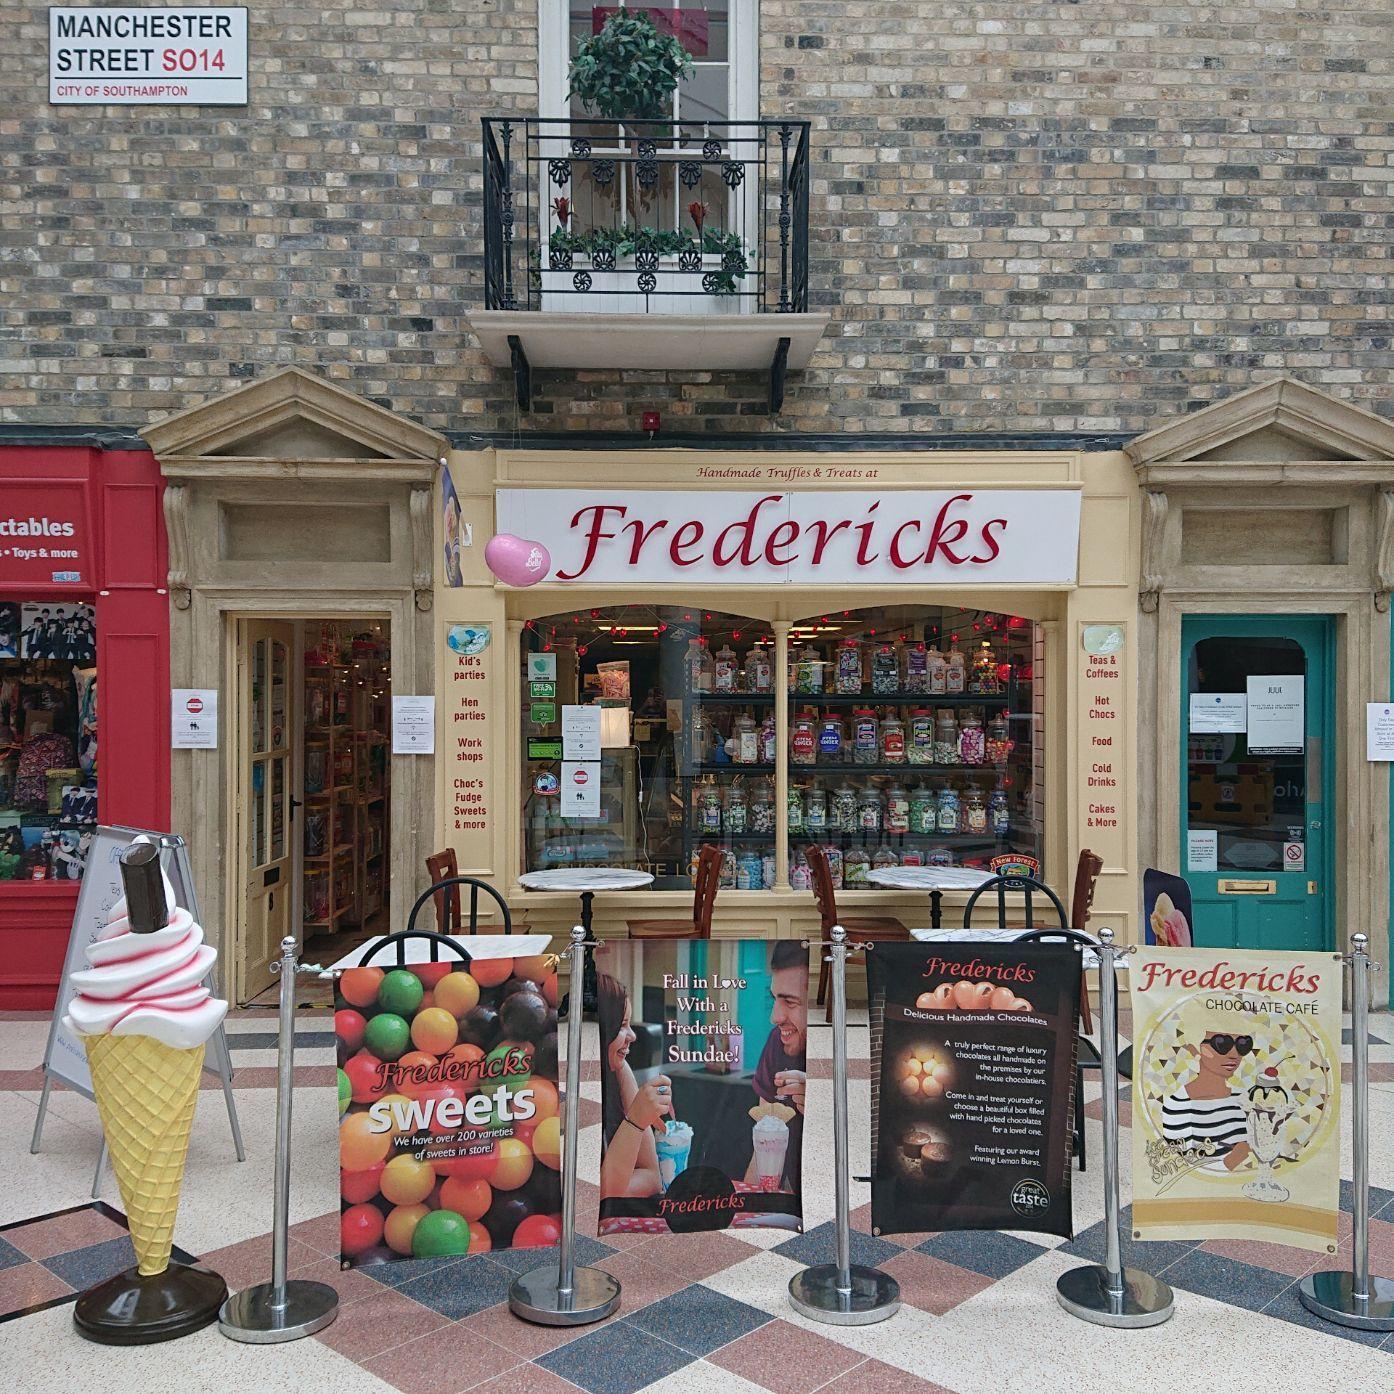 Fredericks Chocolates